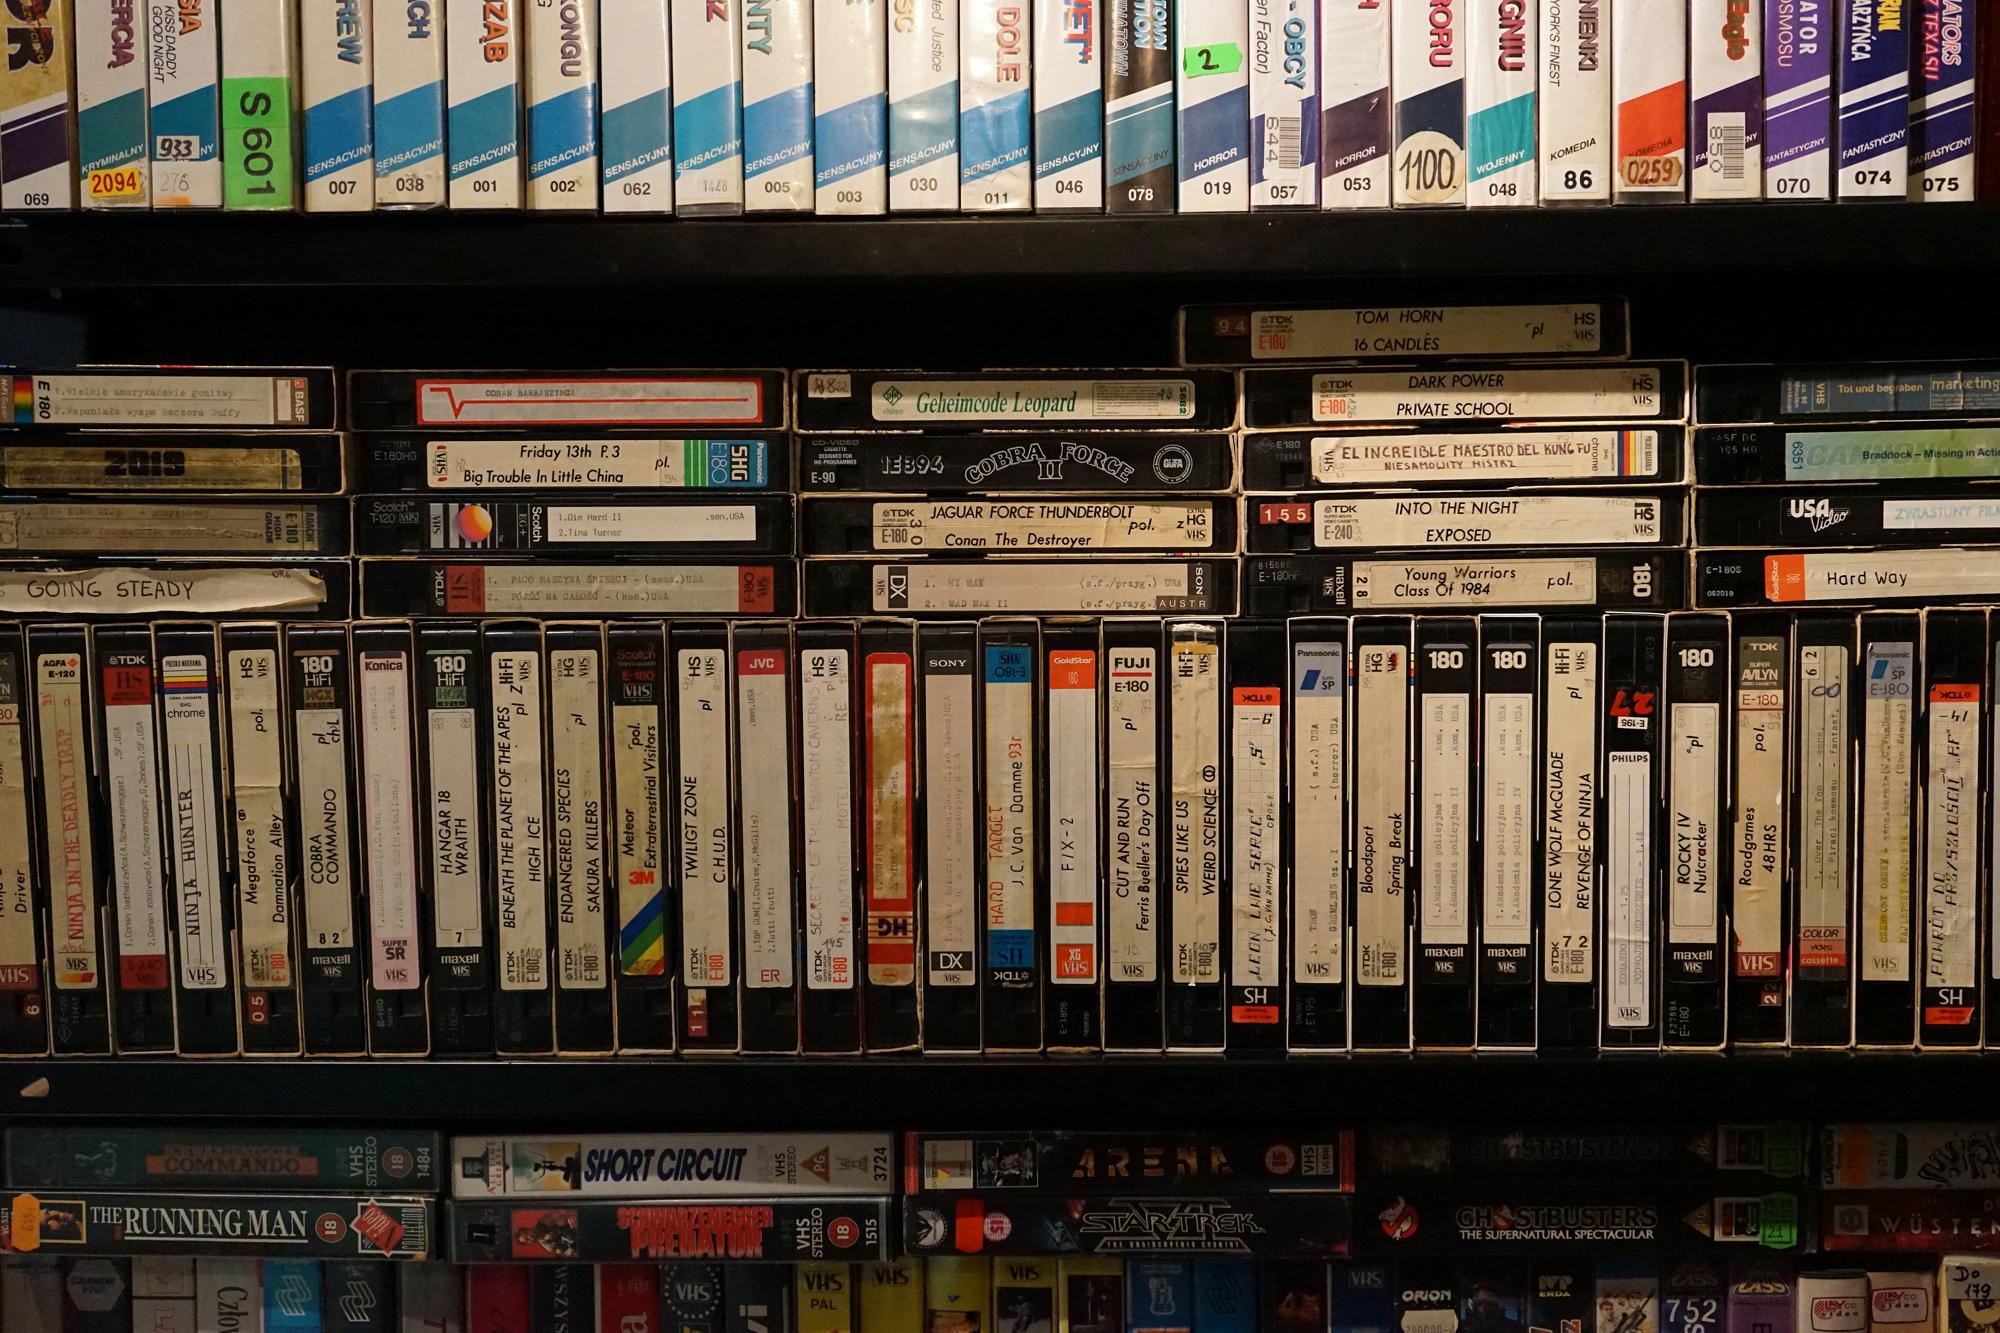 Kolekcja kaset VHS, fot Krystian Kujda